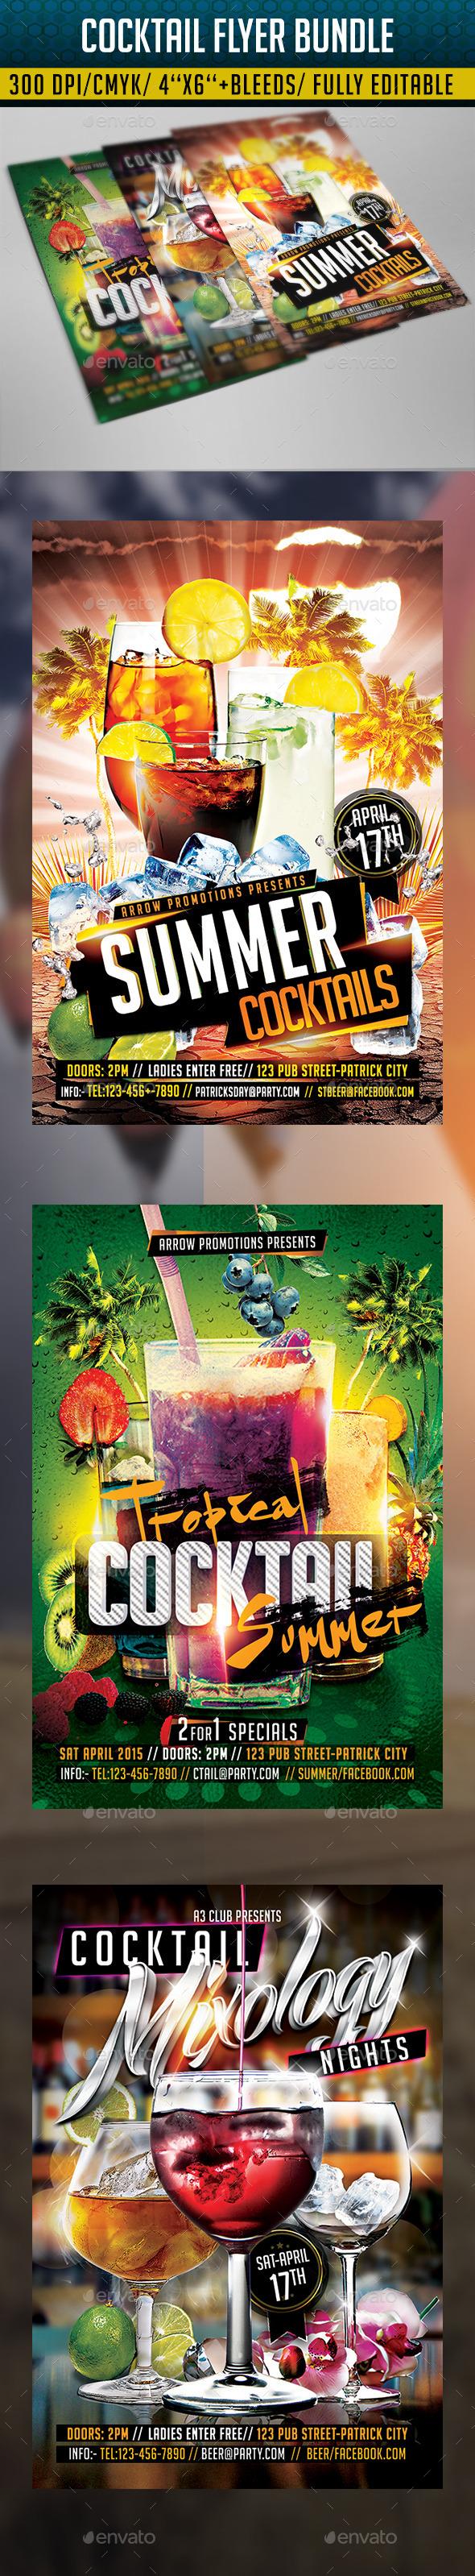 GraphicRiver Cocktail Flyer Bundle 2 11332707